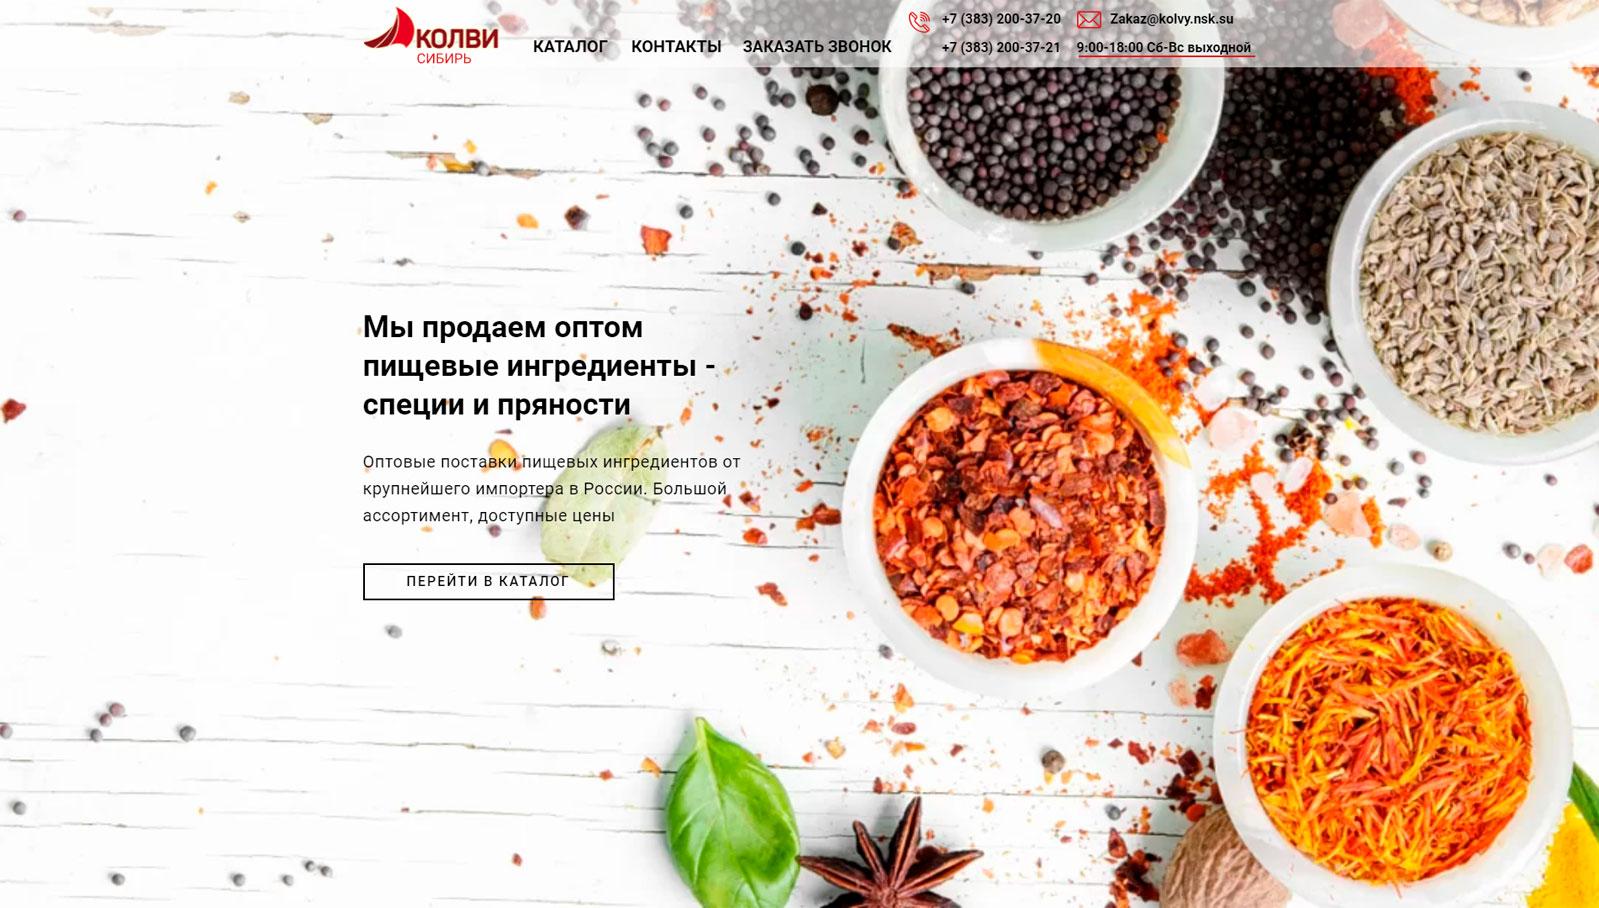 SPS_sajt_kolvy-sib.ru